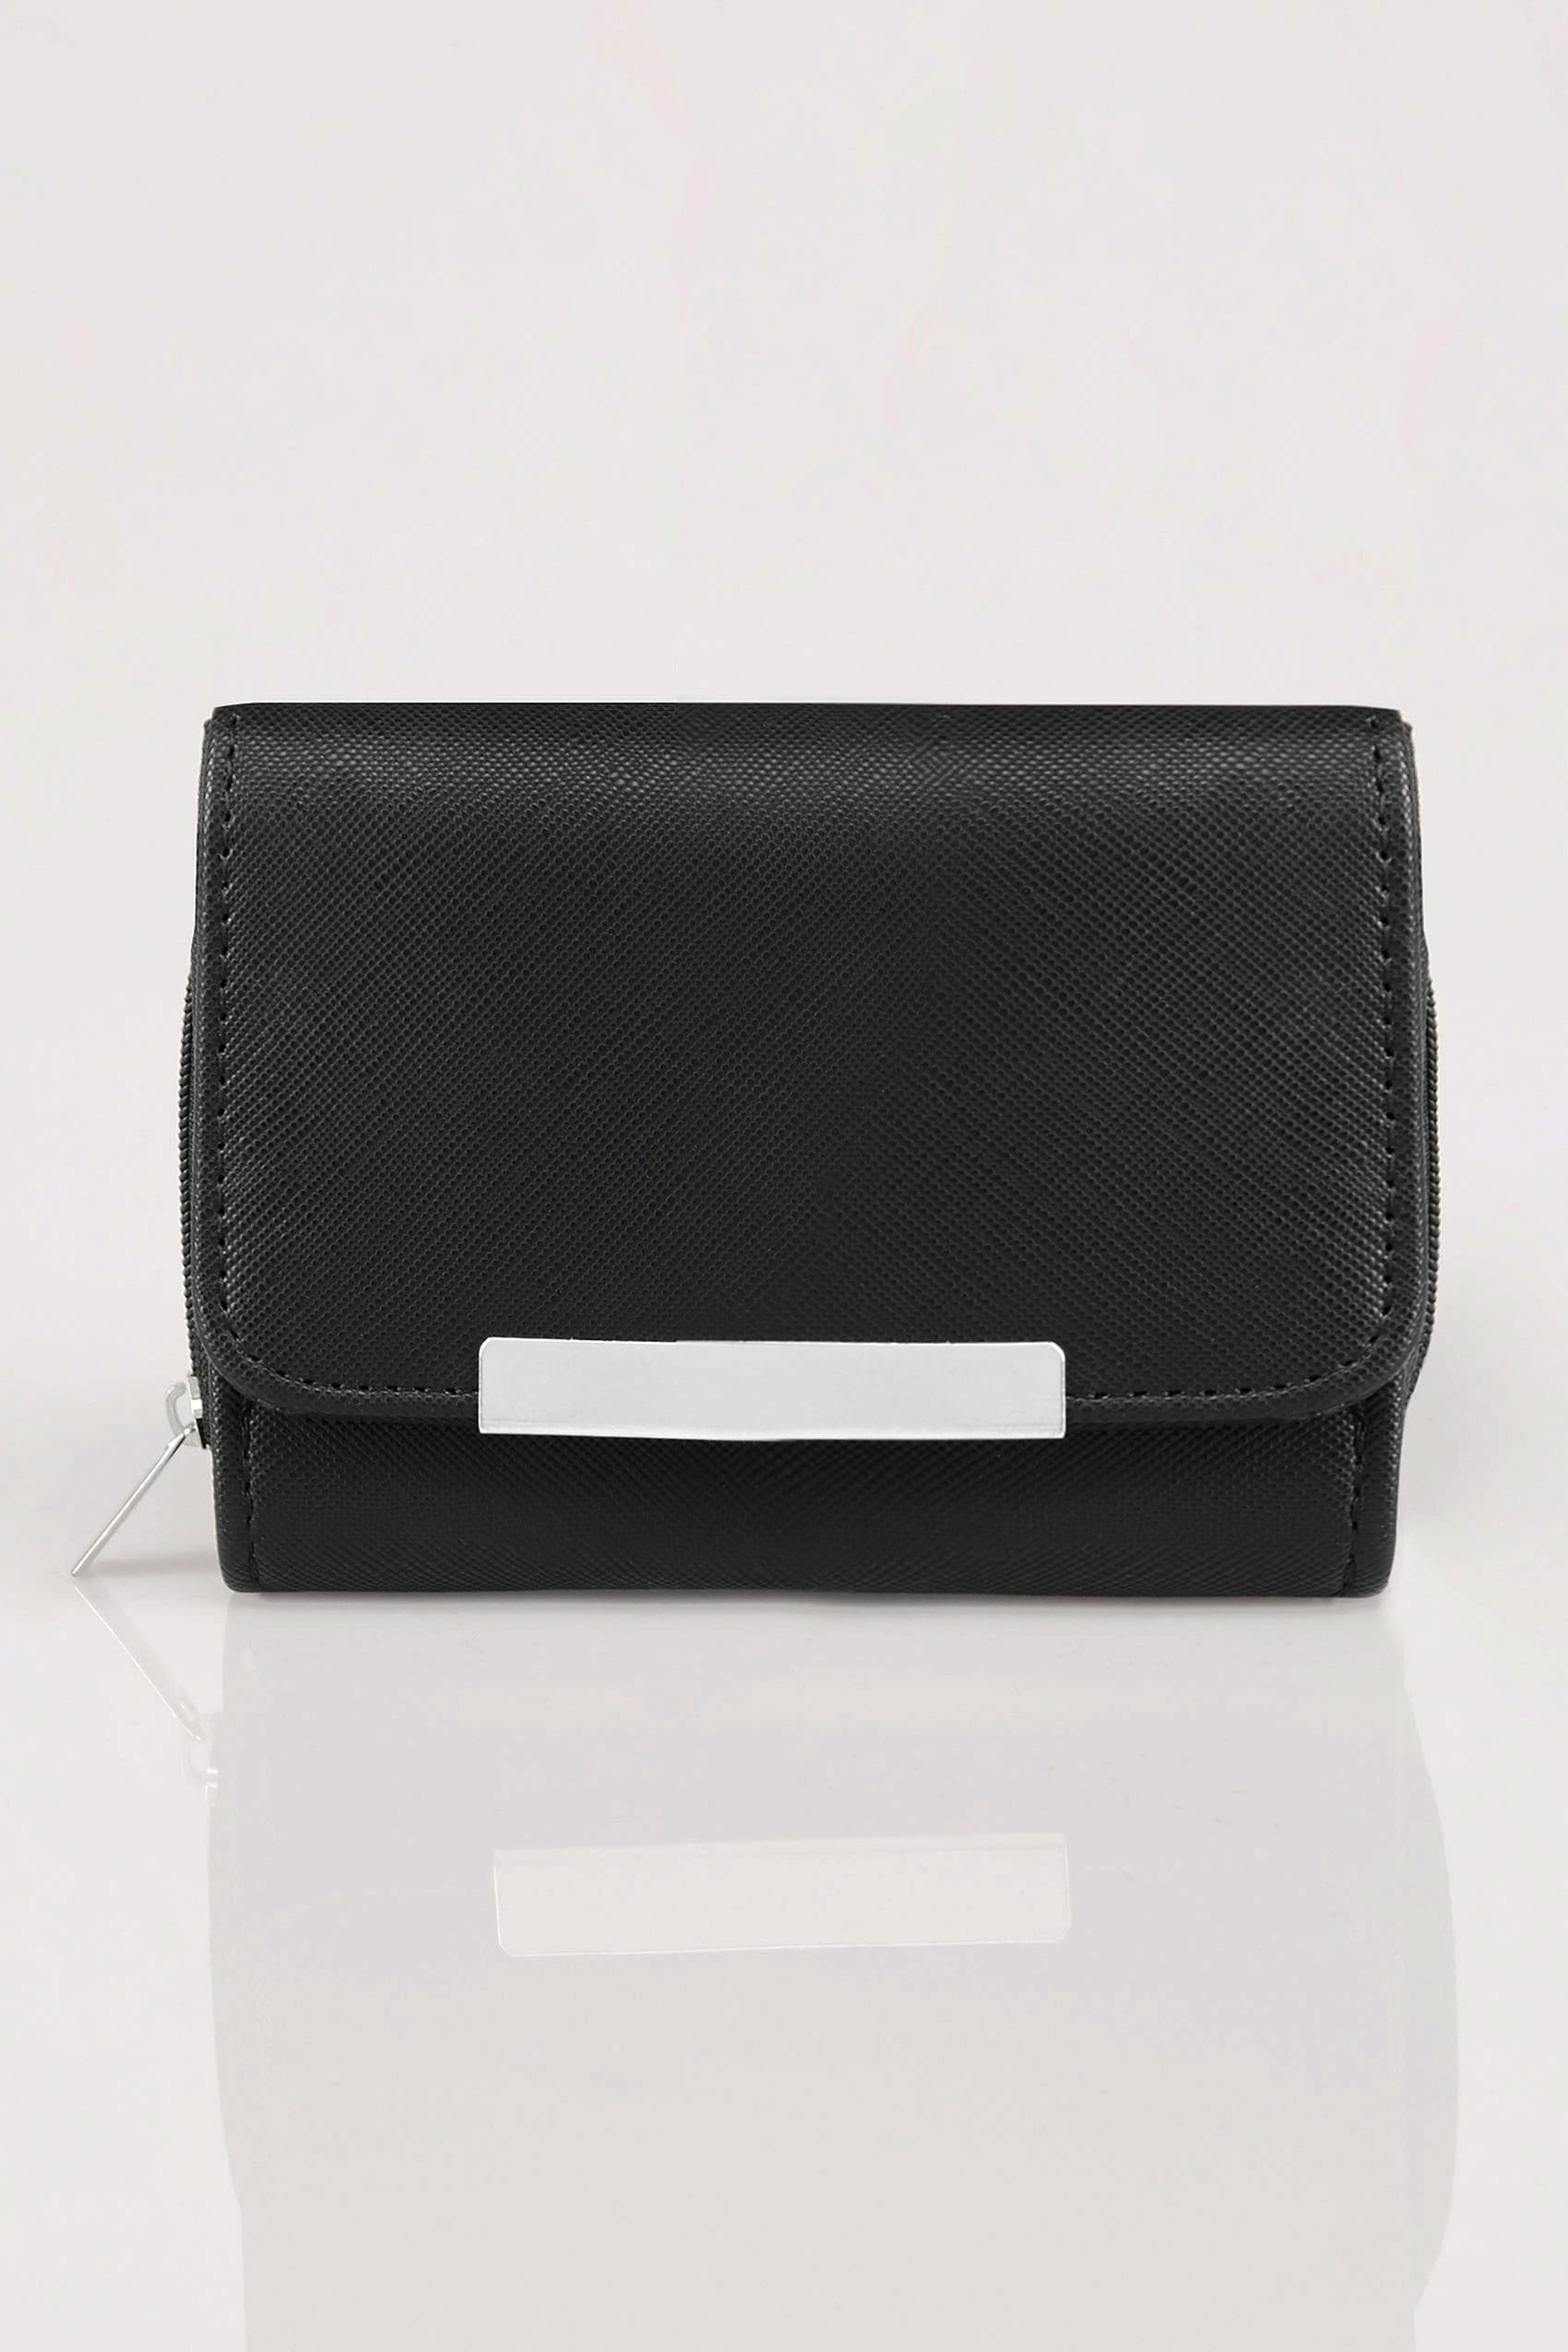 black zip around purse with metal bar trim p